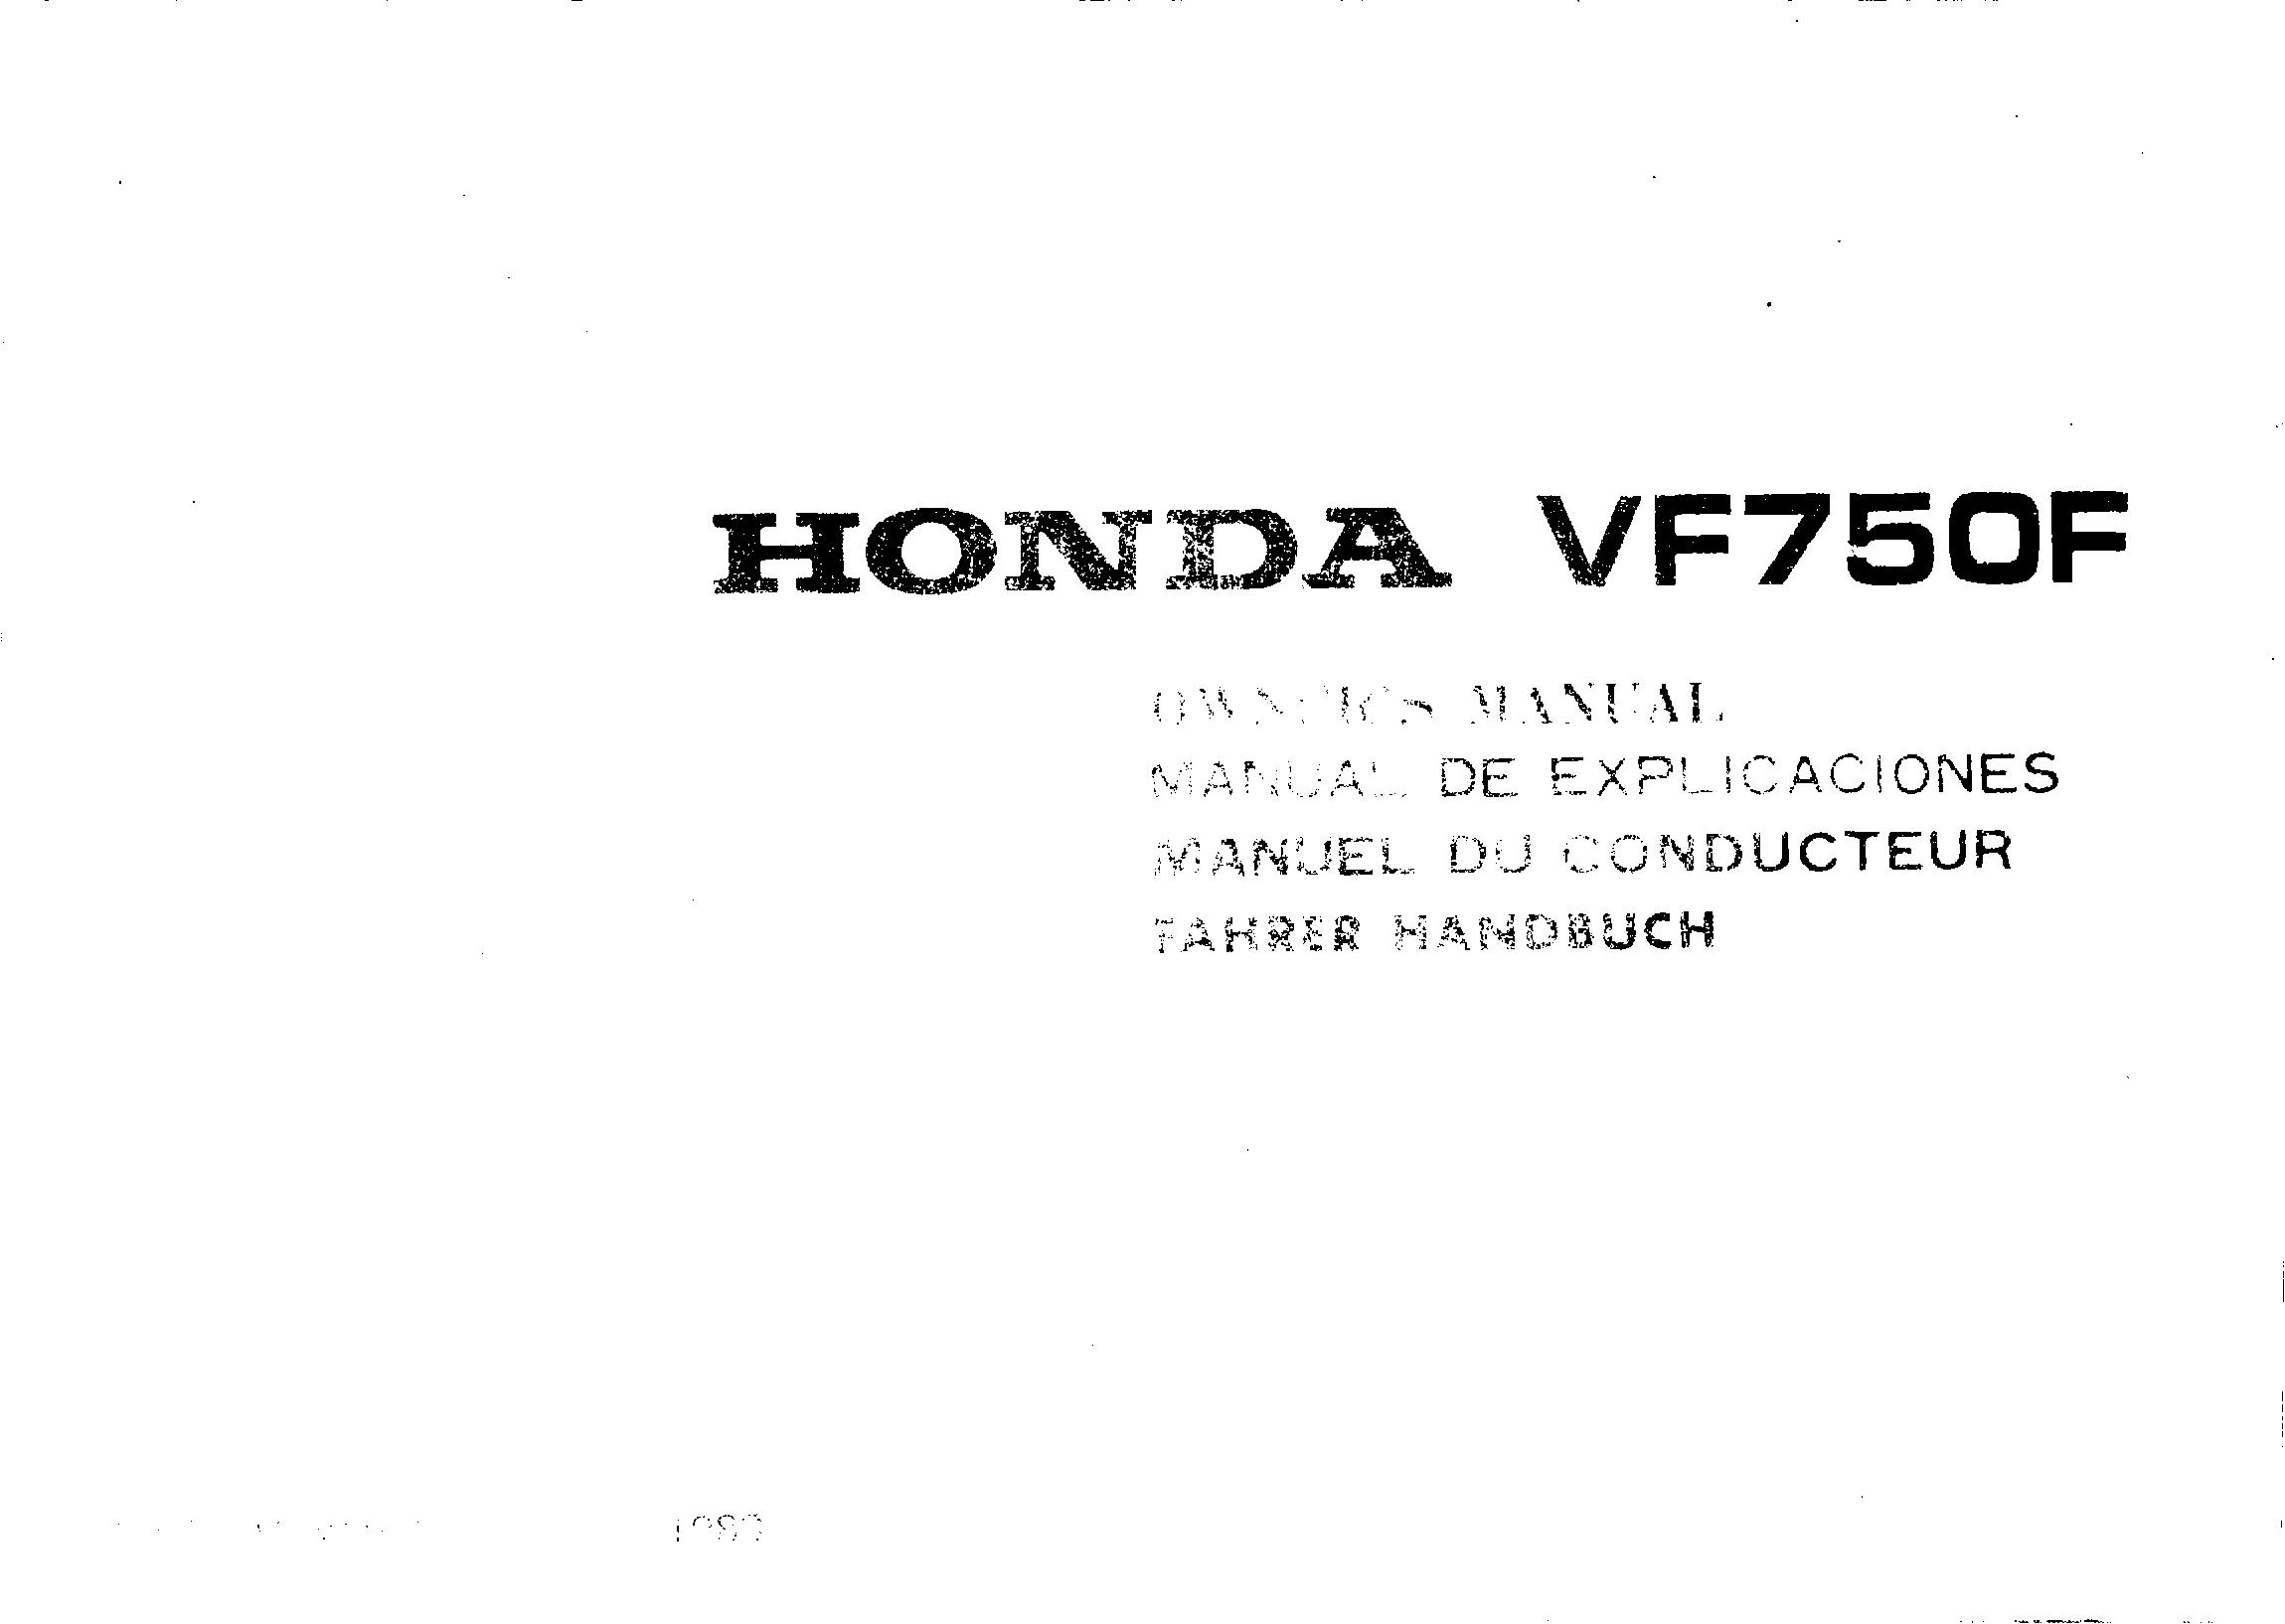 Owner's manual for Honda VF750F (1984)